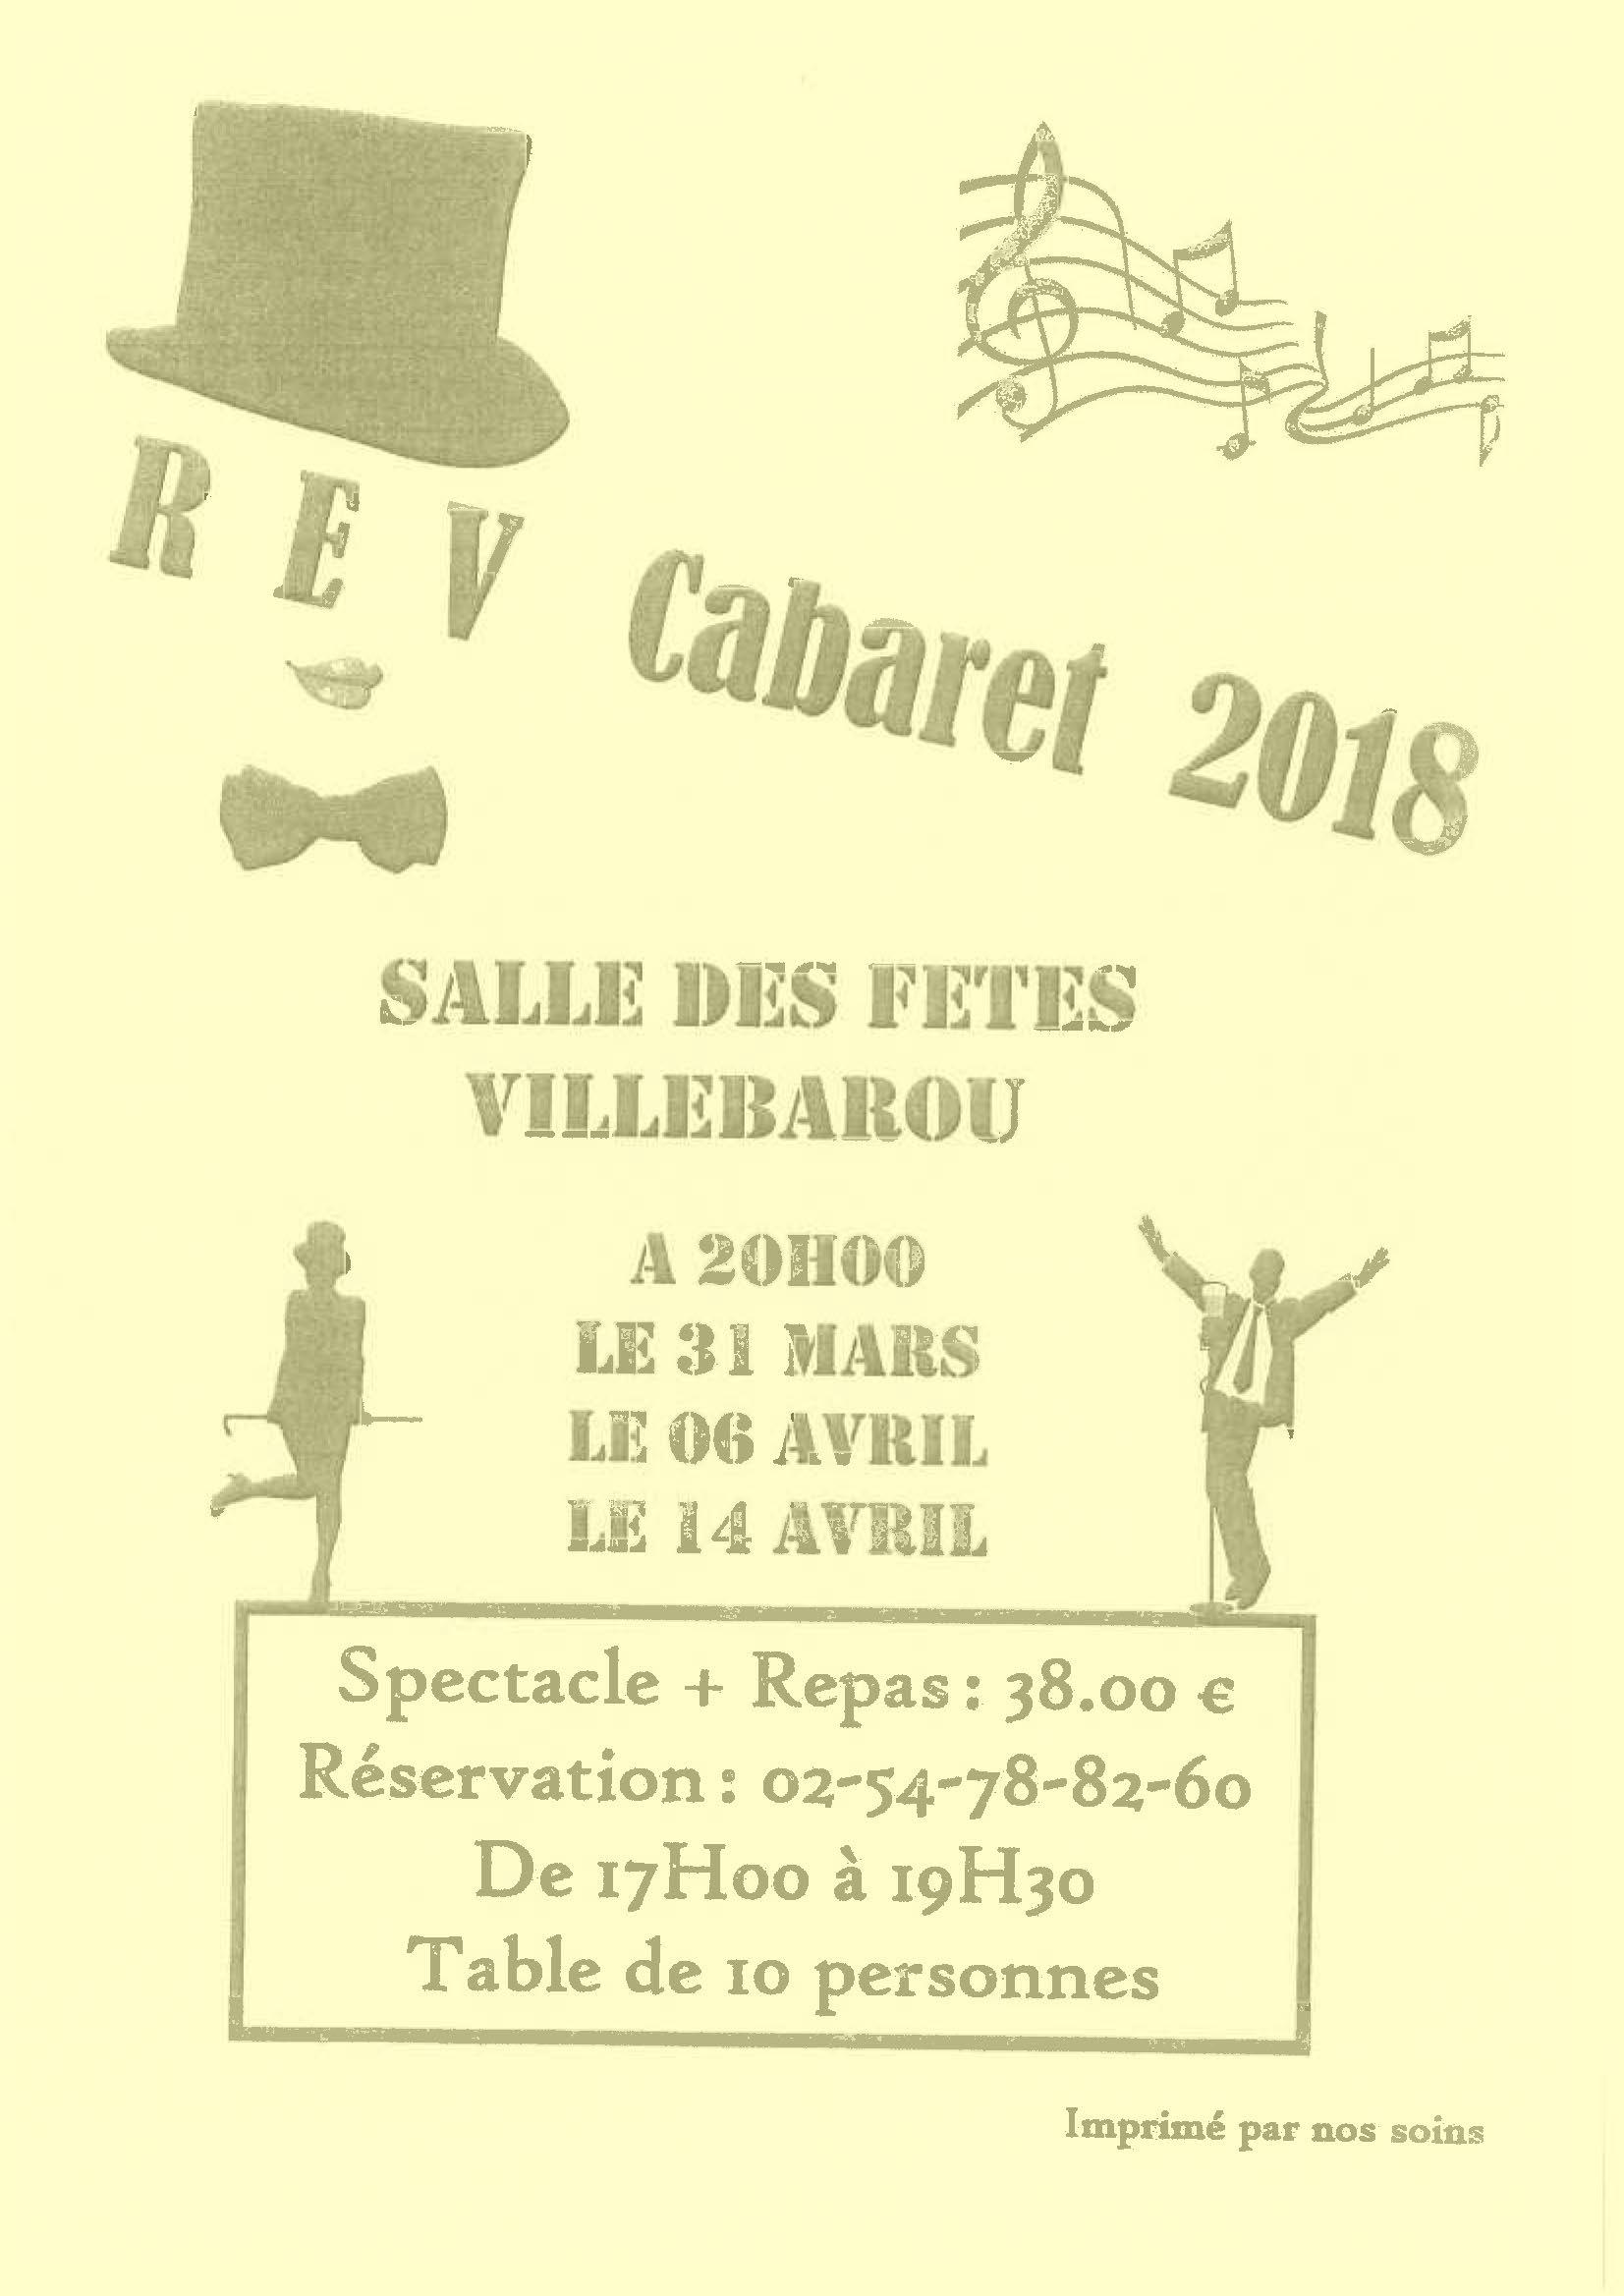 REV - Cabaret